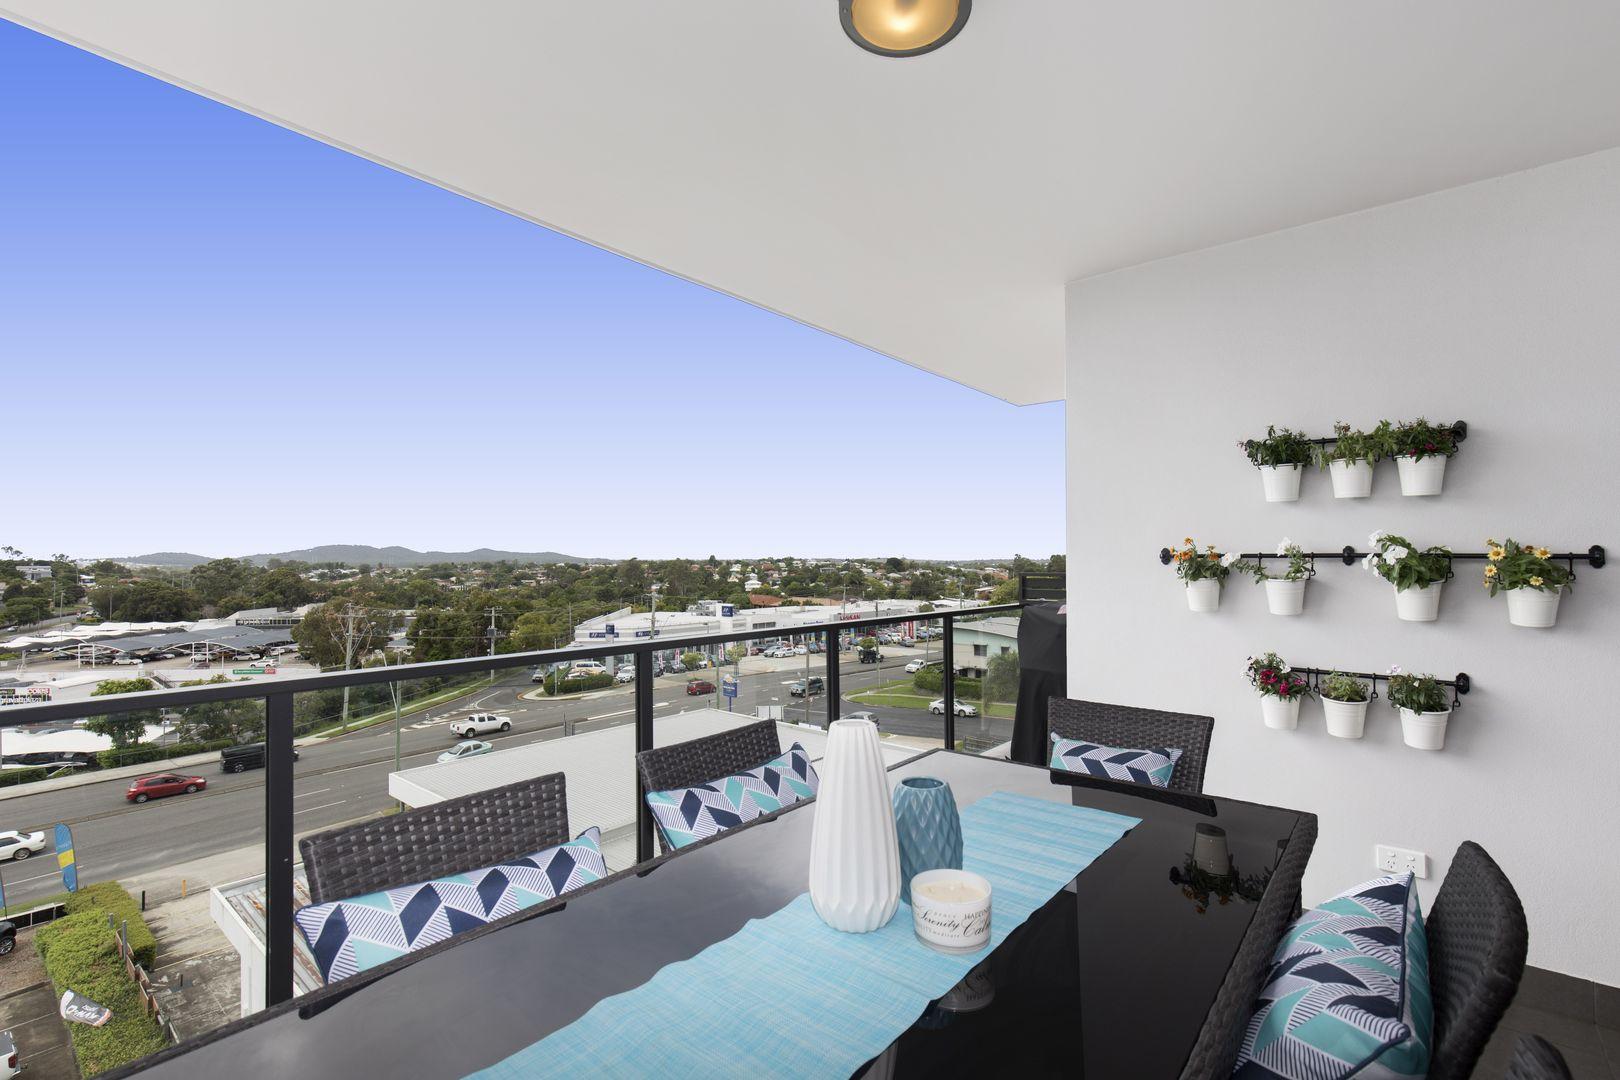 16/64 Tenby Street, Mount Gravatt QLD 4122, Image 1